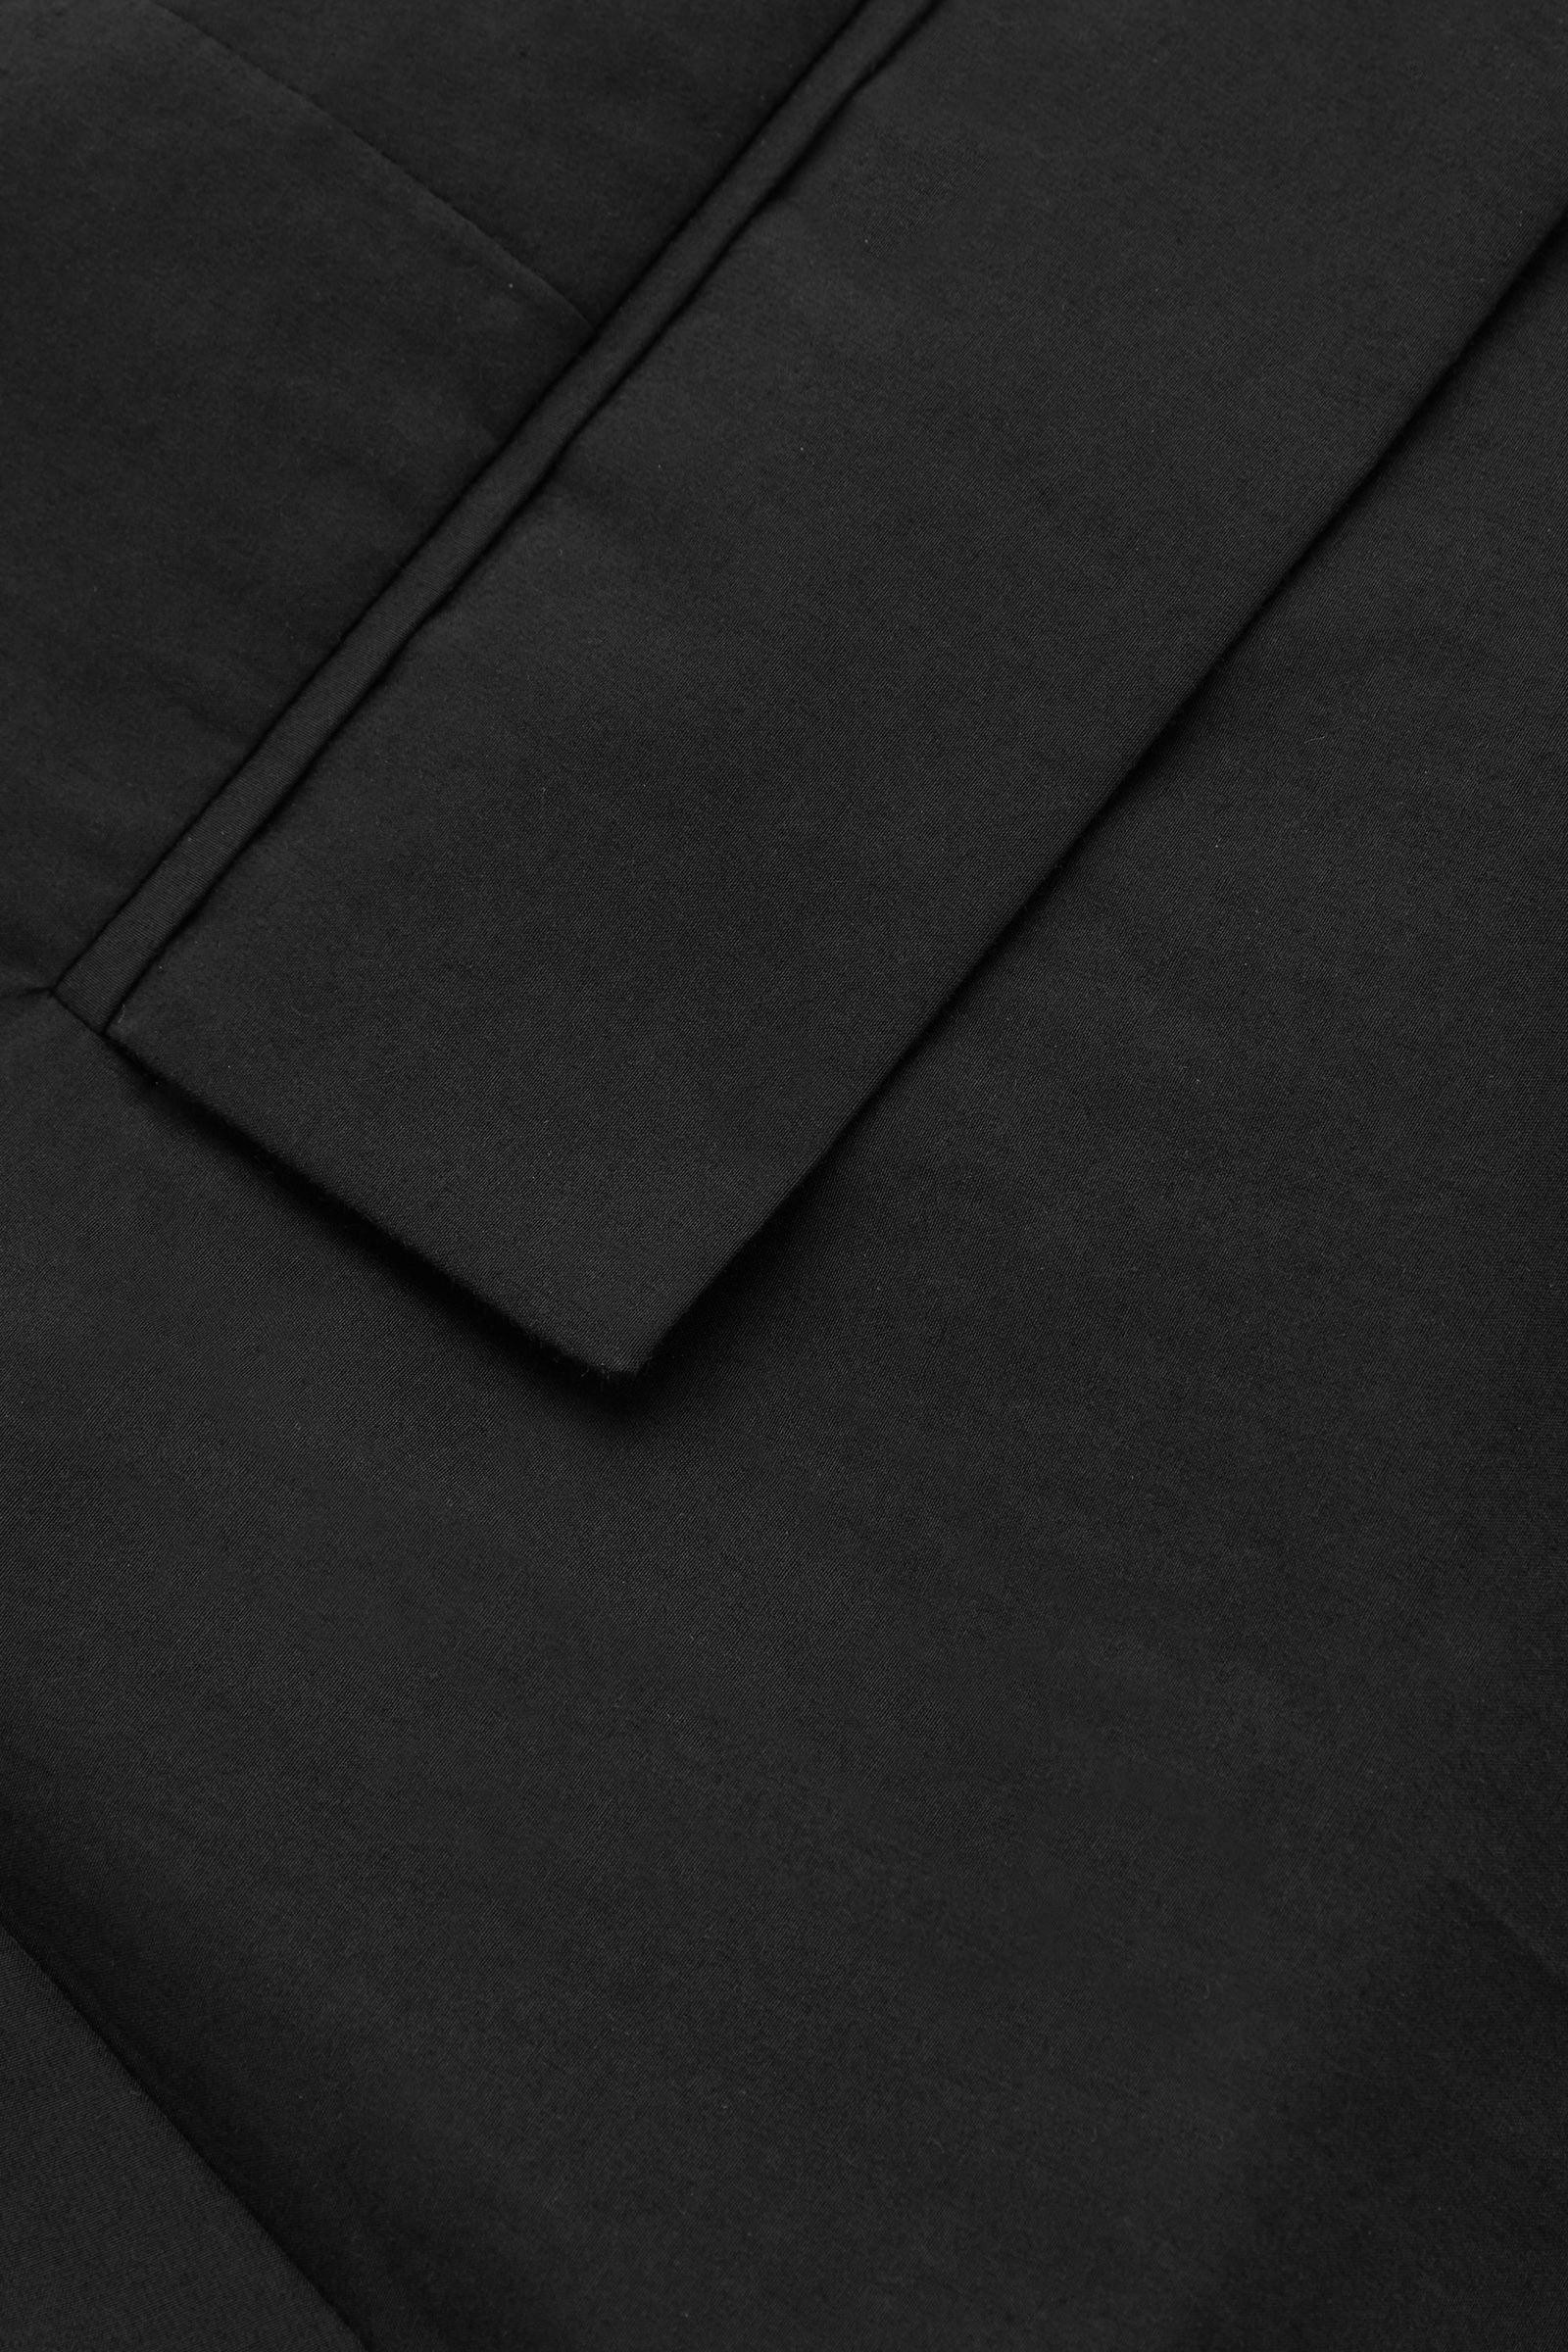 COS 유틸리티 스타일 코튼 믹스 트라우저의 블랙컬러 Detail입니다.